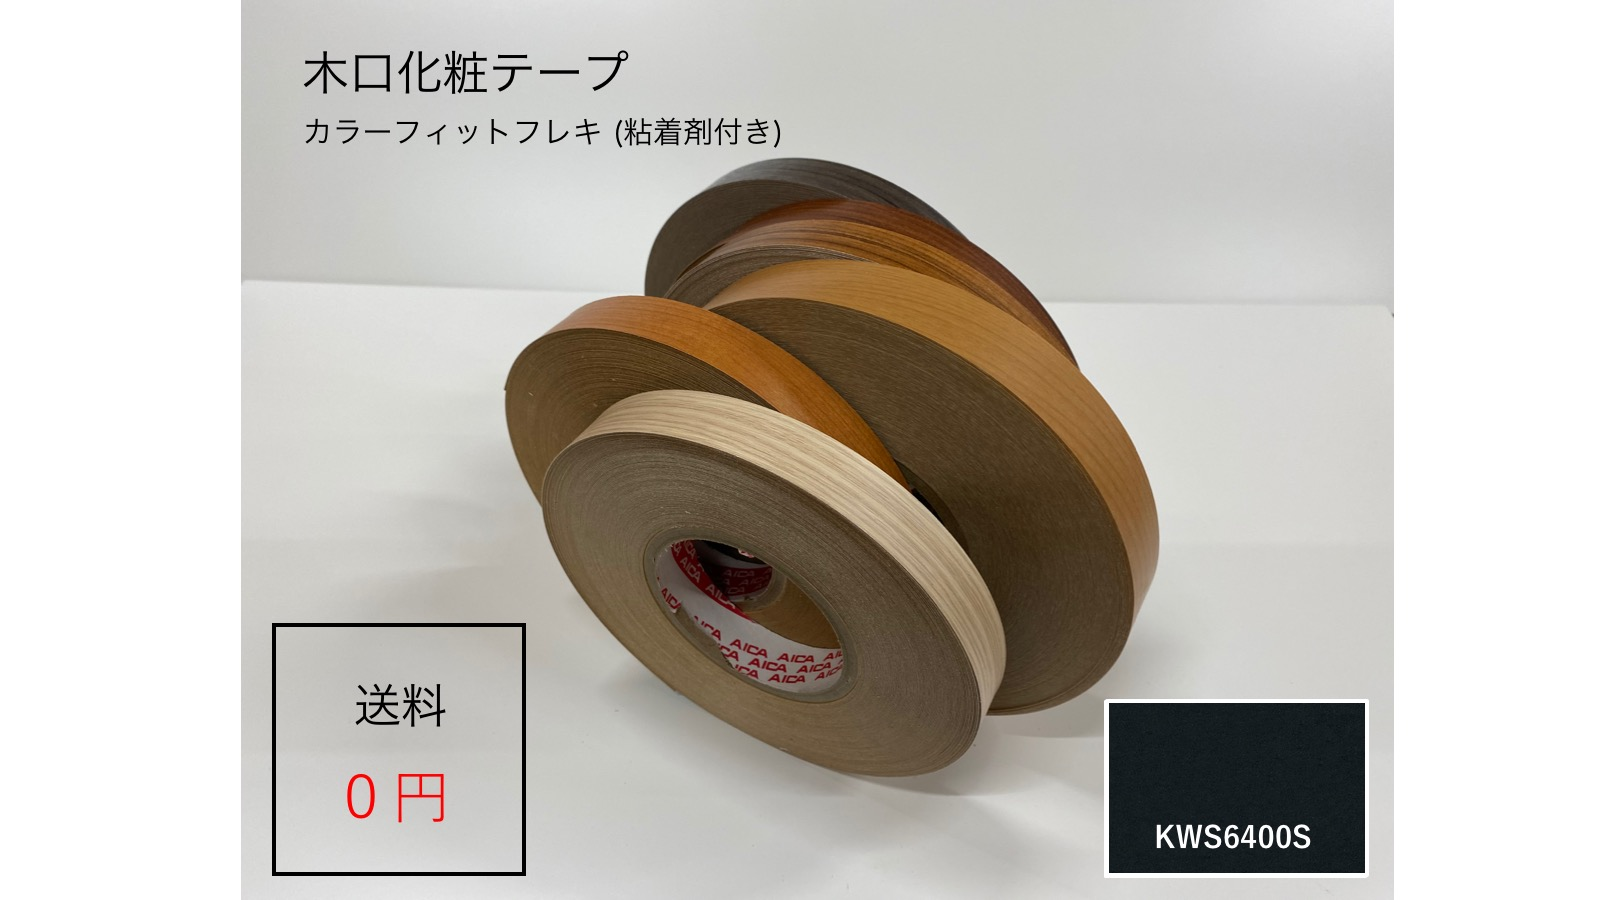 KWS6400S30x50 AICA アイカ 木口テープ DIY 限定価格セール カラーフィットフレキ アイカフレキ 2020春夏新作 エンボスタイプ 単色 ダップ樹脂テープ 厚さ0.3mmx幅30mmx長さ50m ダップ樹脂粘着木口テープ 粘着剤付き KWS6400S